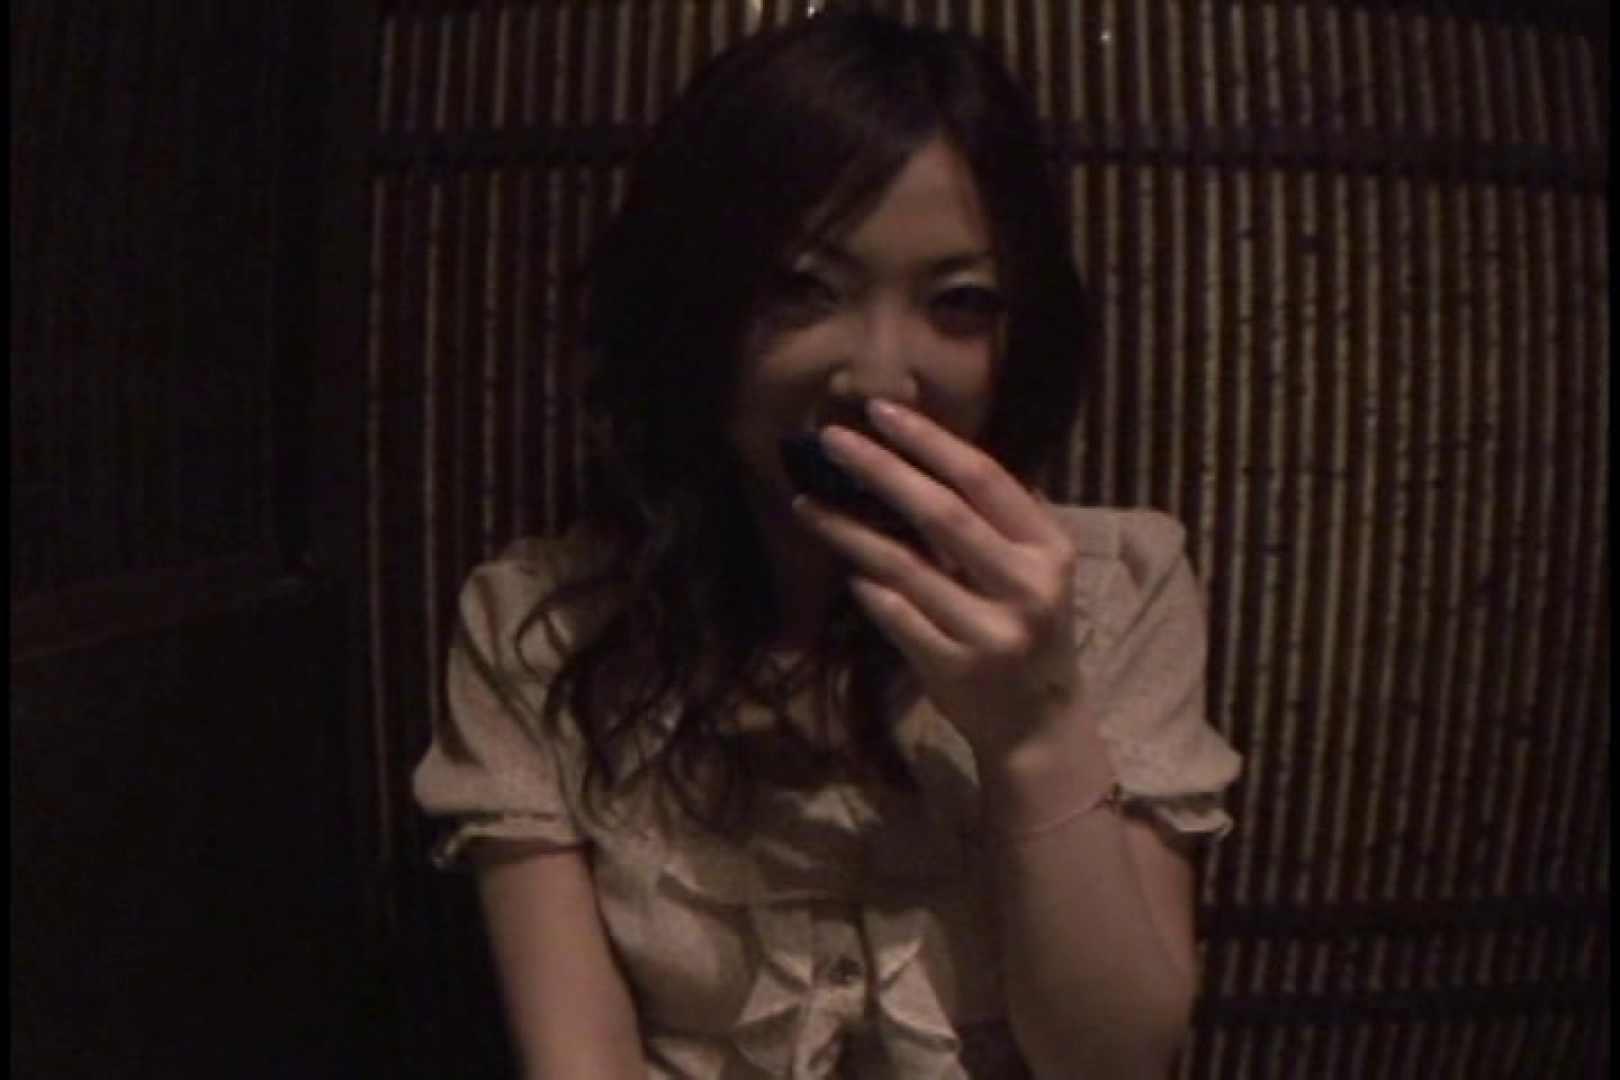 JDハンター全国ツアー vol.041 後編 女子大生のエロ動画  82PIX 2